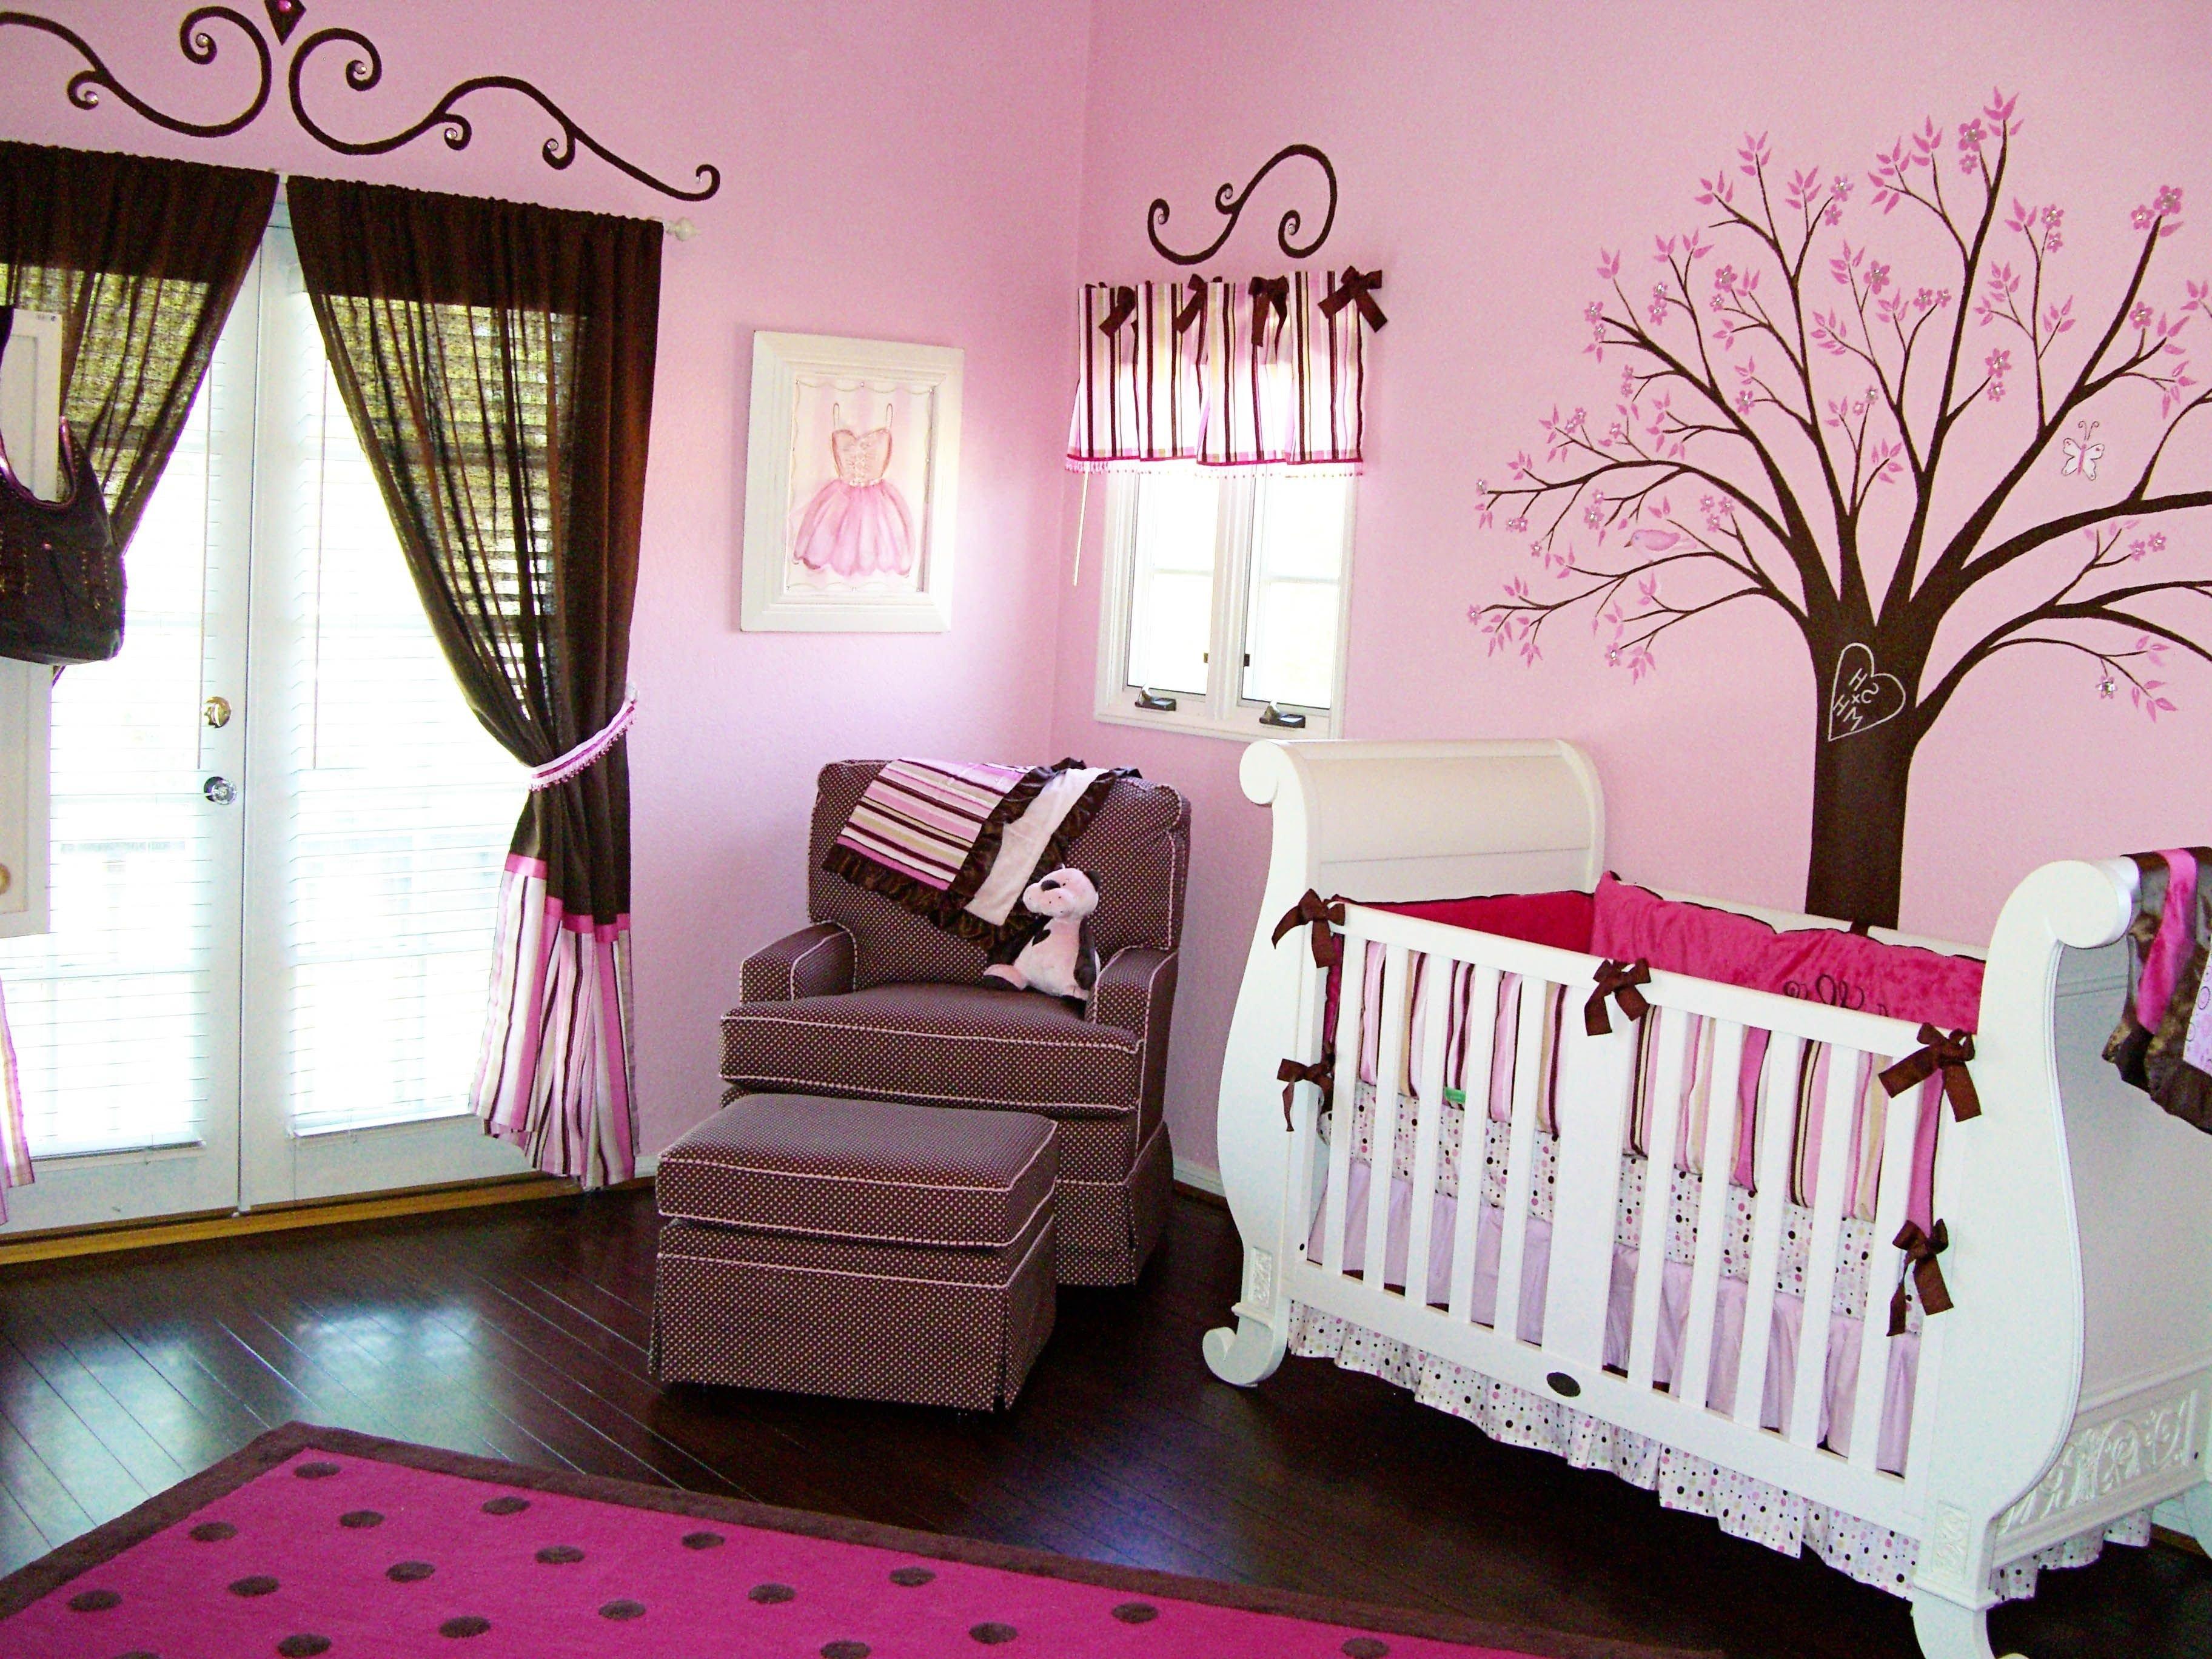 10 Wonderful Baby Girl Nursery Decorating Ideas interior beautiful theme girl baby nursery ideas wooden component 3 2020